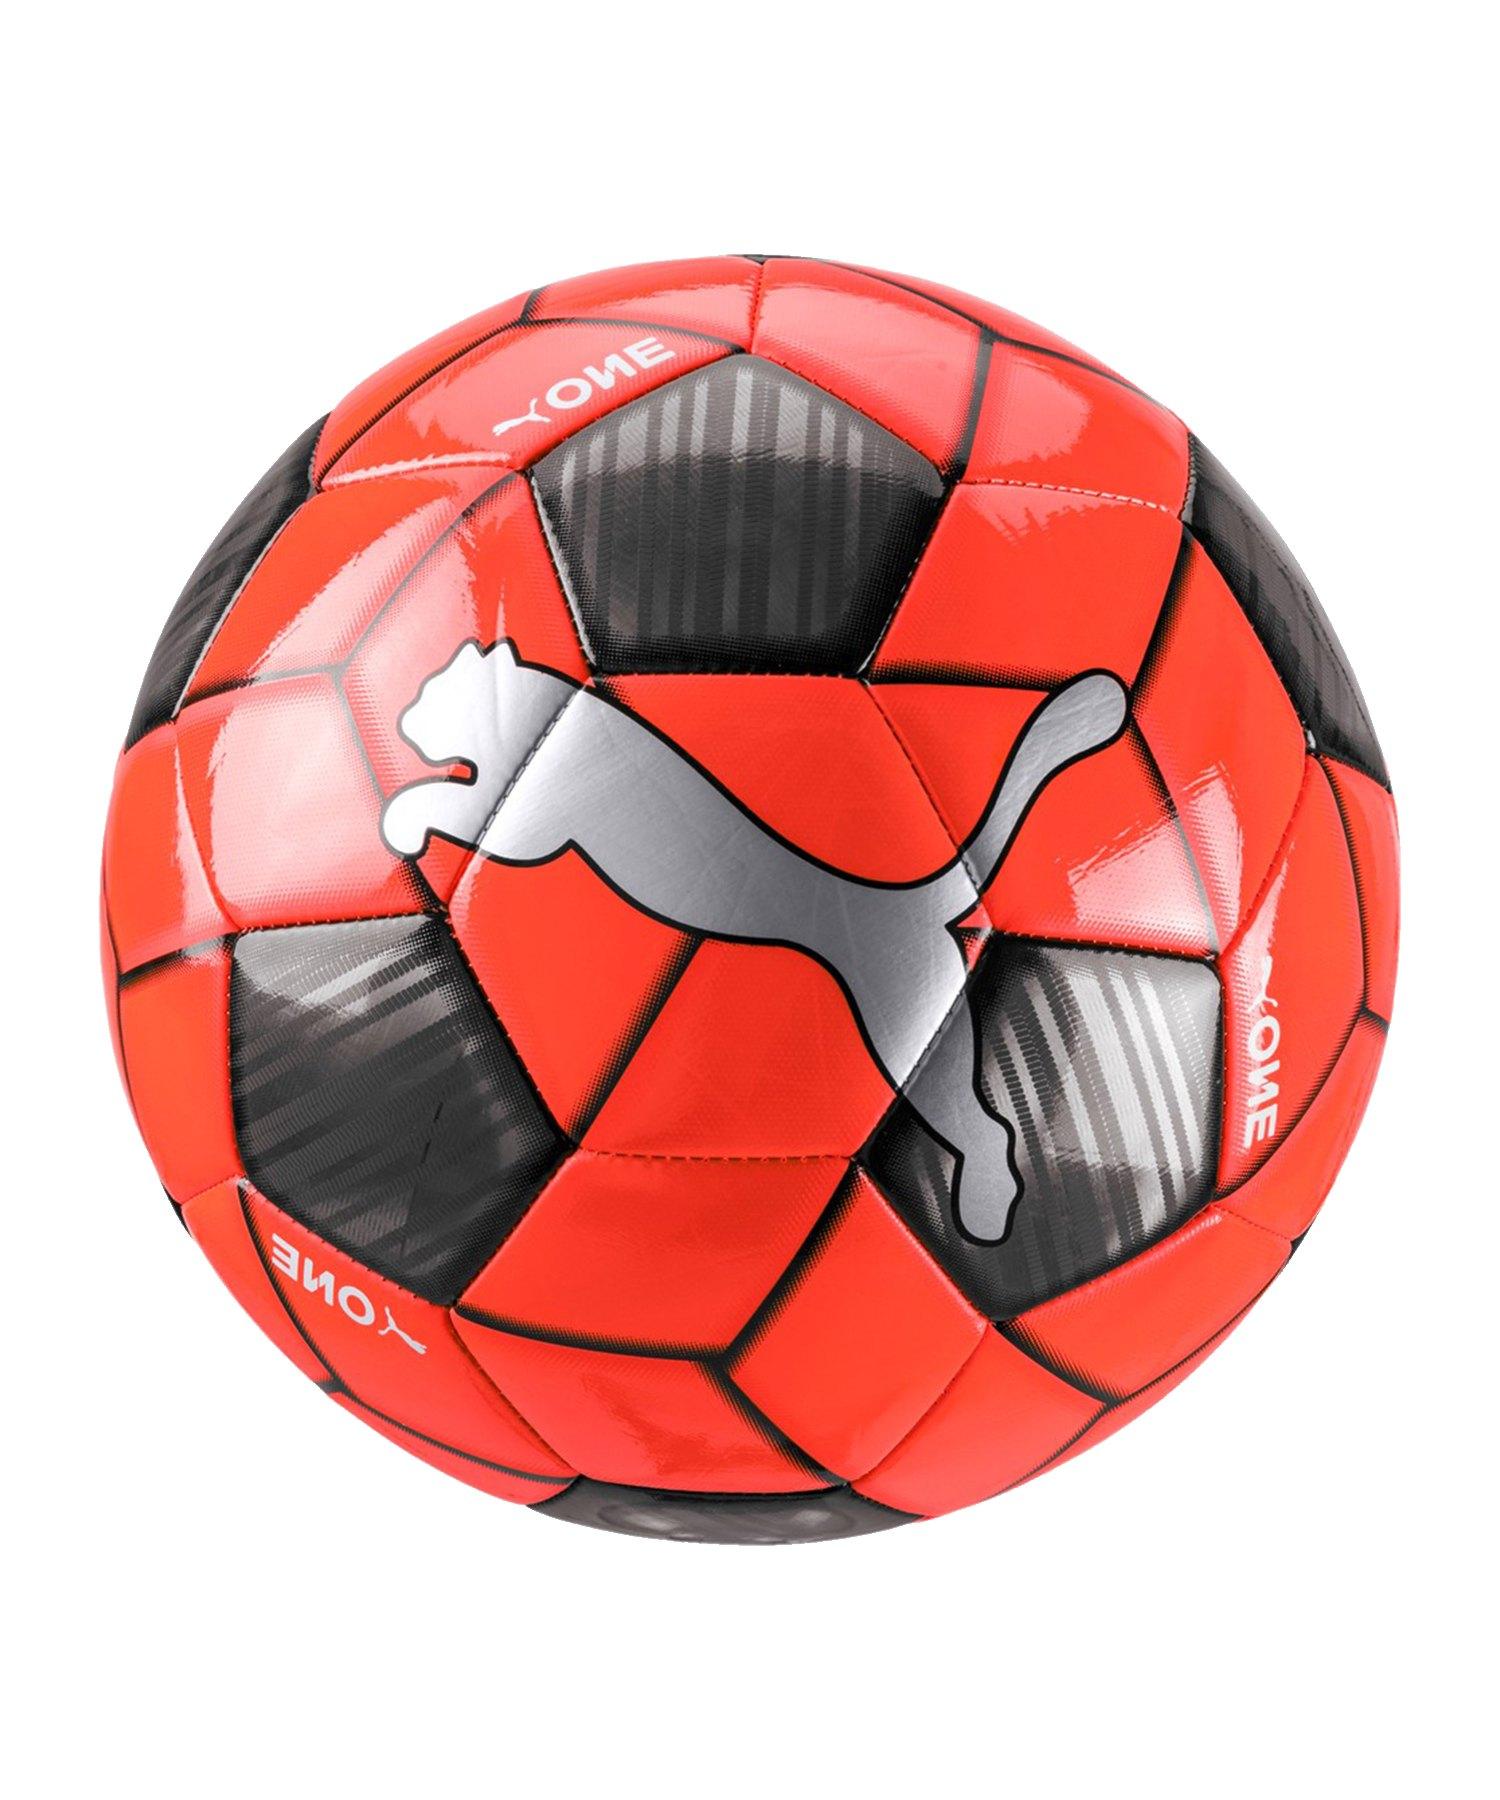 PUMA ONE Strap Trainingsball Rot Silber Weiss F02 - Rot